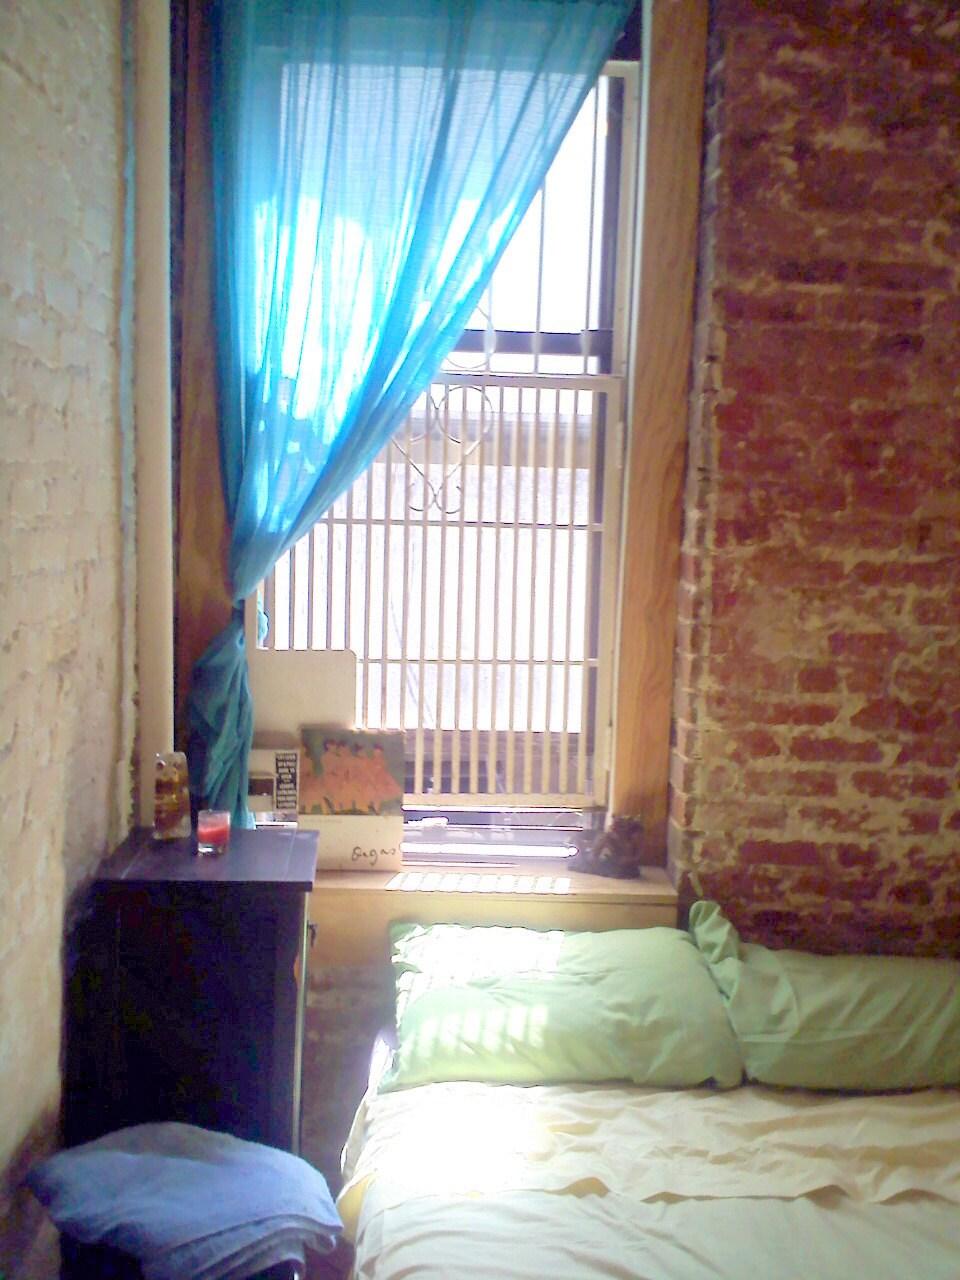 Exposed brick, natural light, locked windows